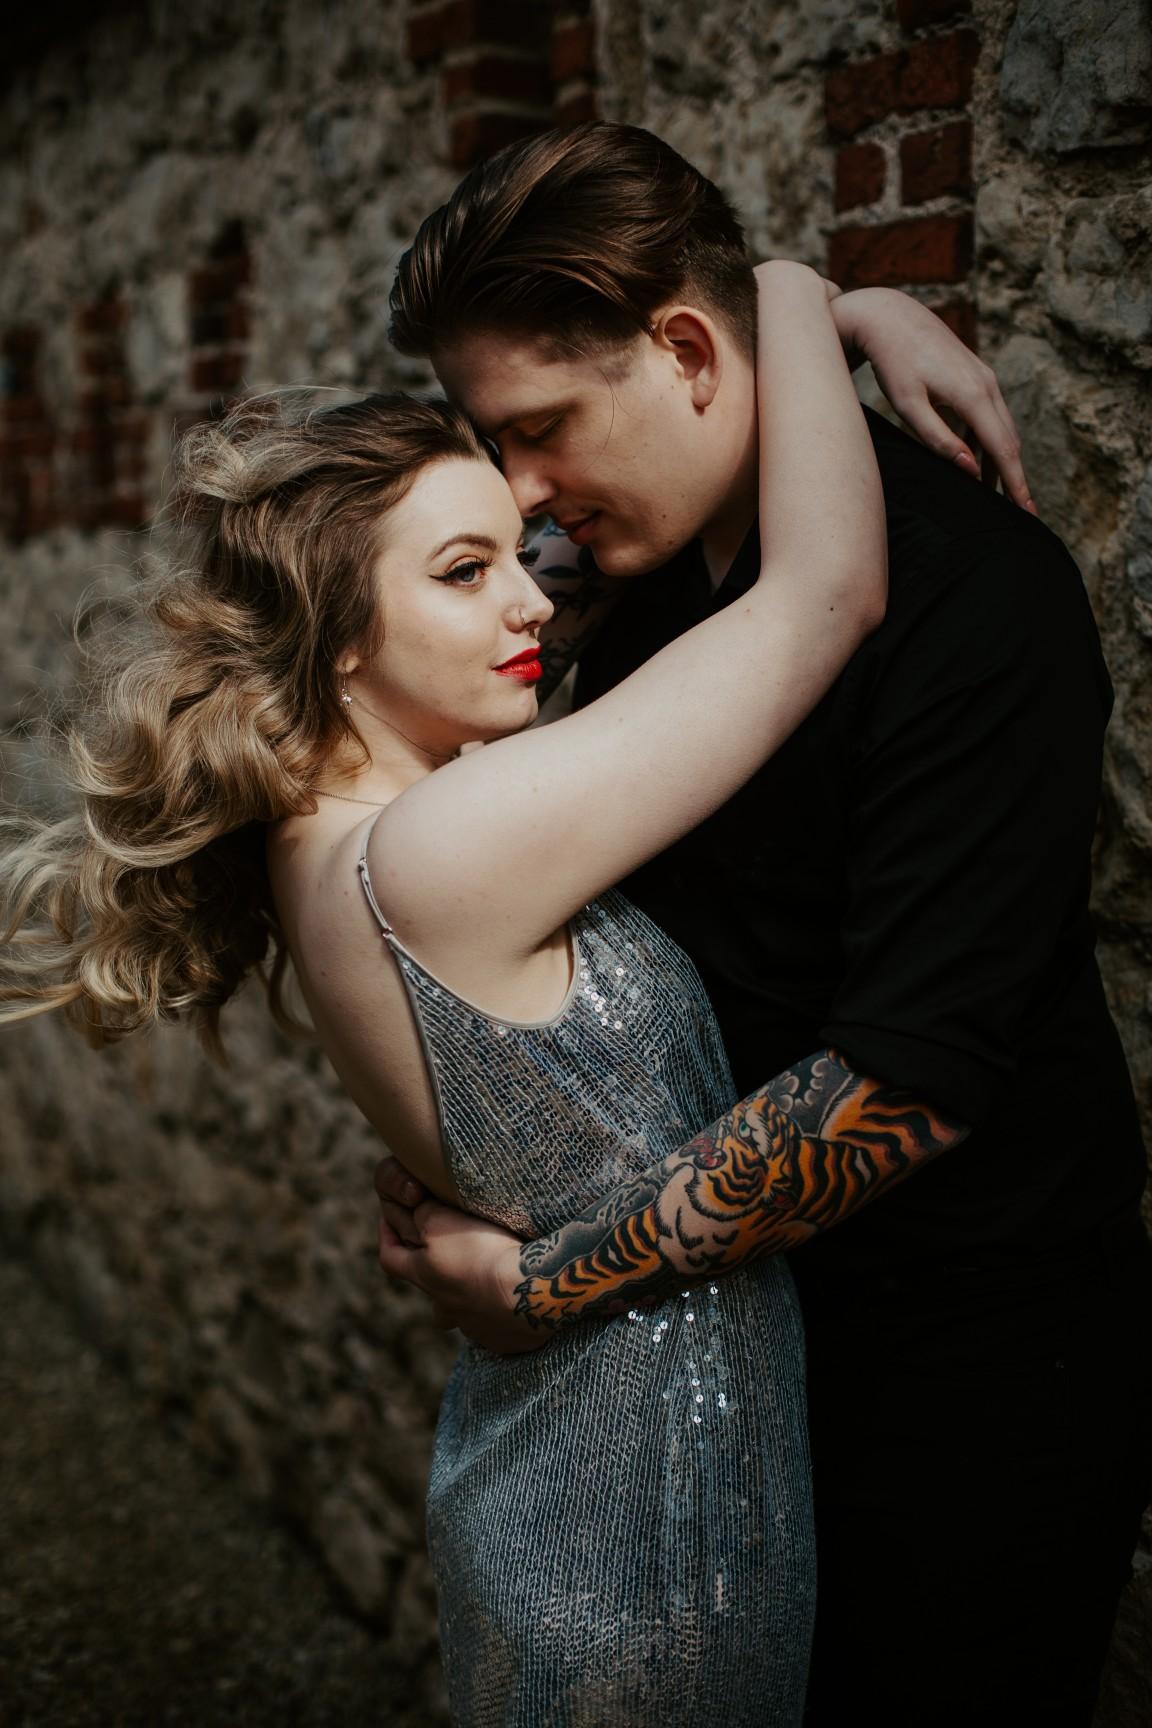 rock and roll wedding - edgy wedding inspiration - sparkly wedding dress - sequin wedding dress - edgy bride